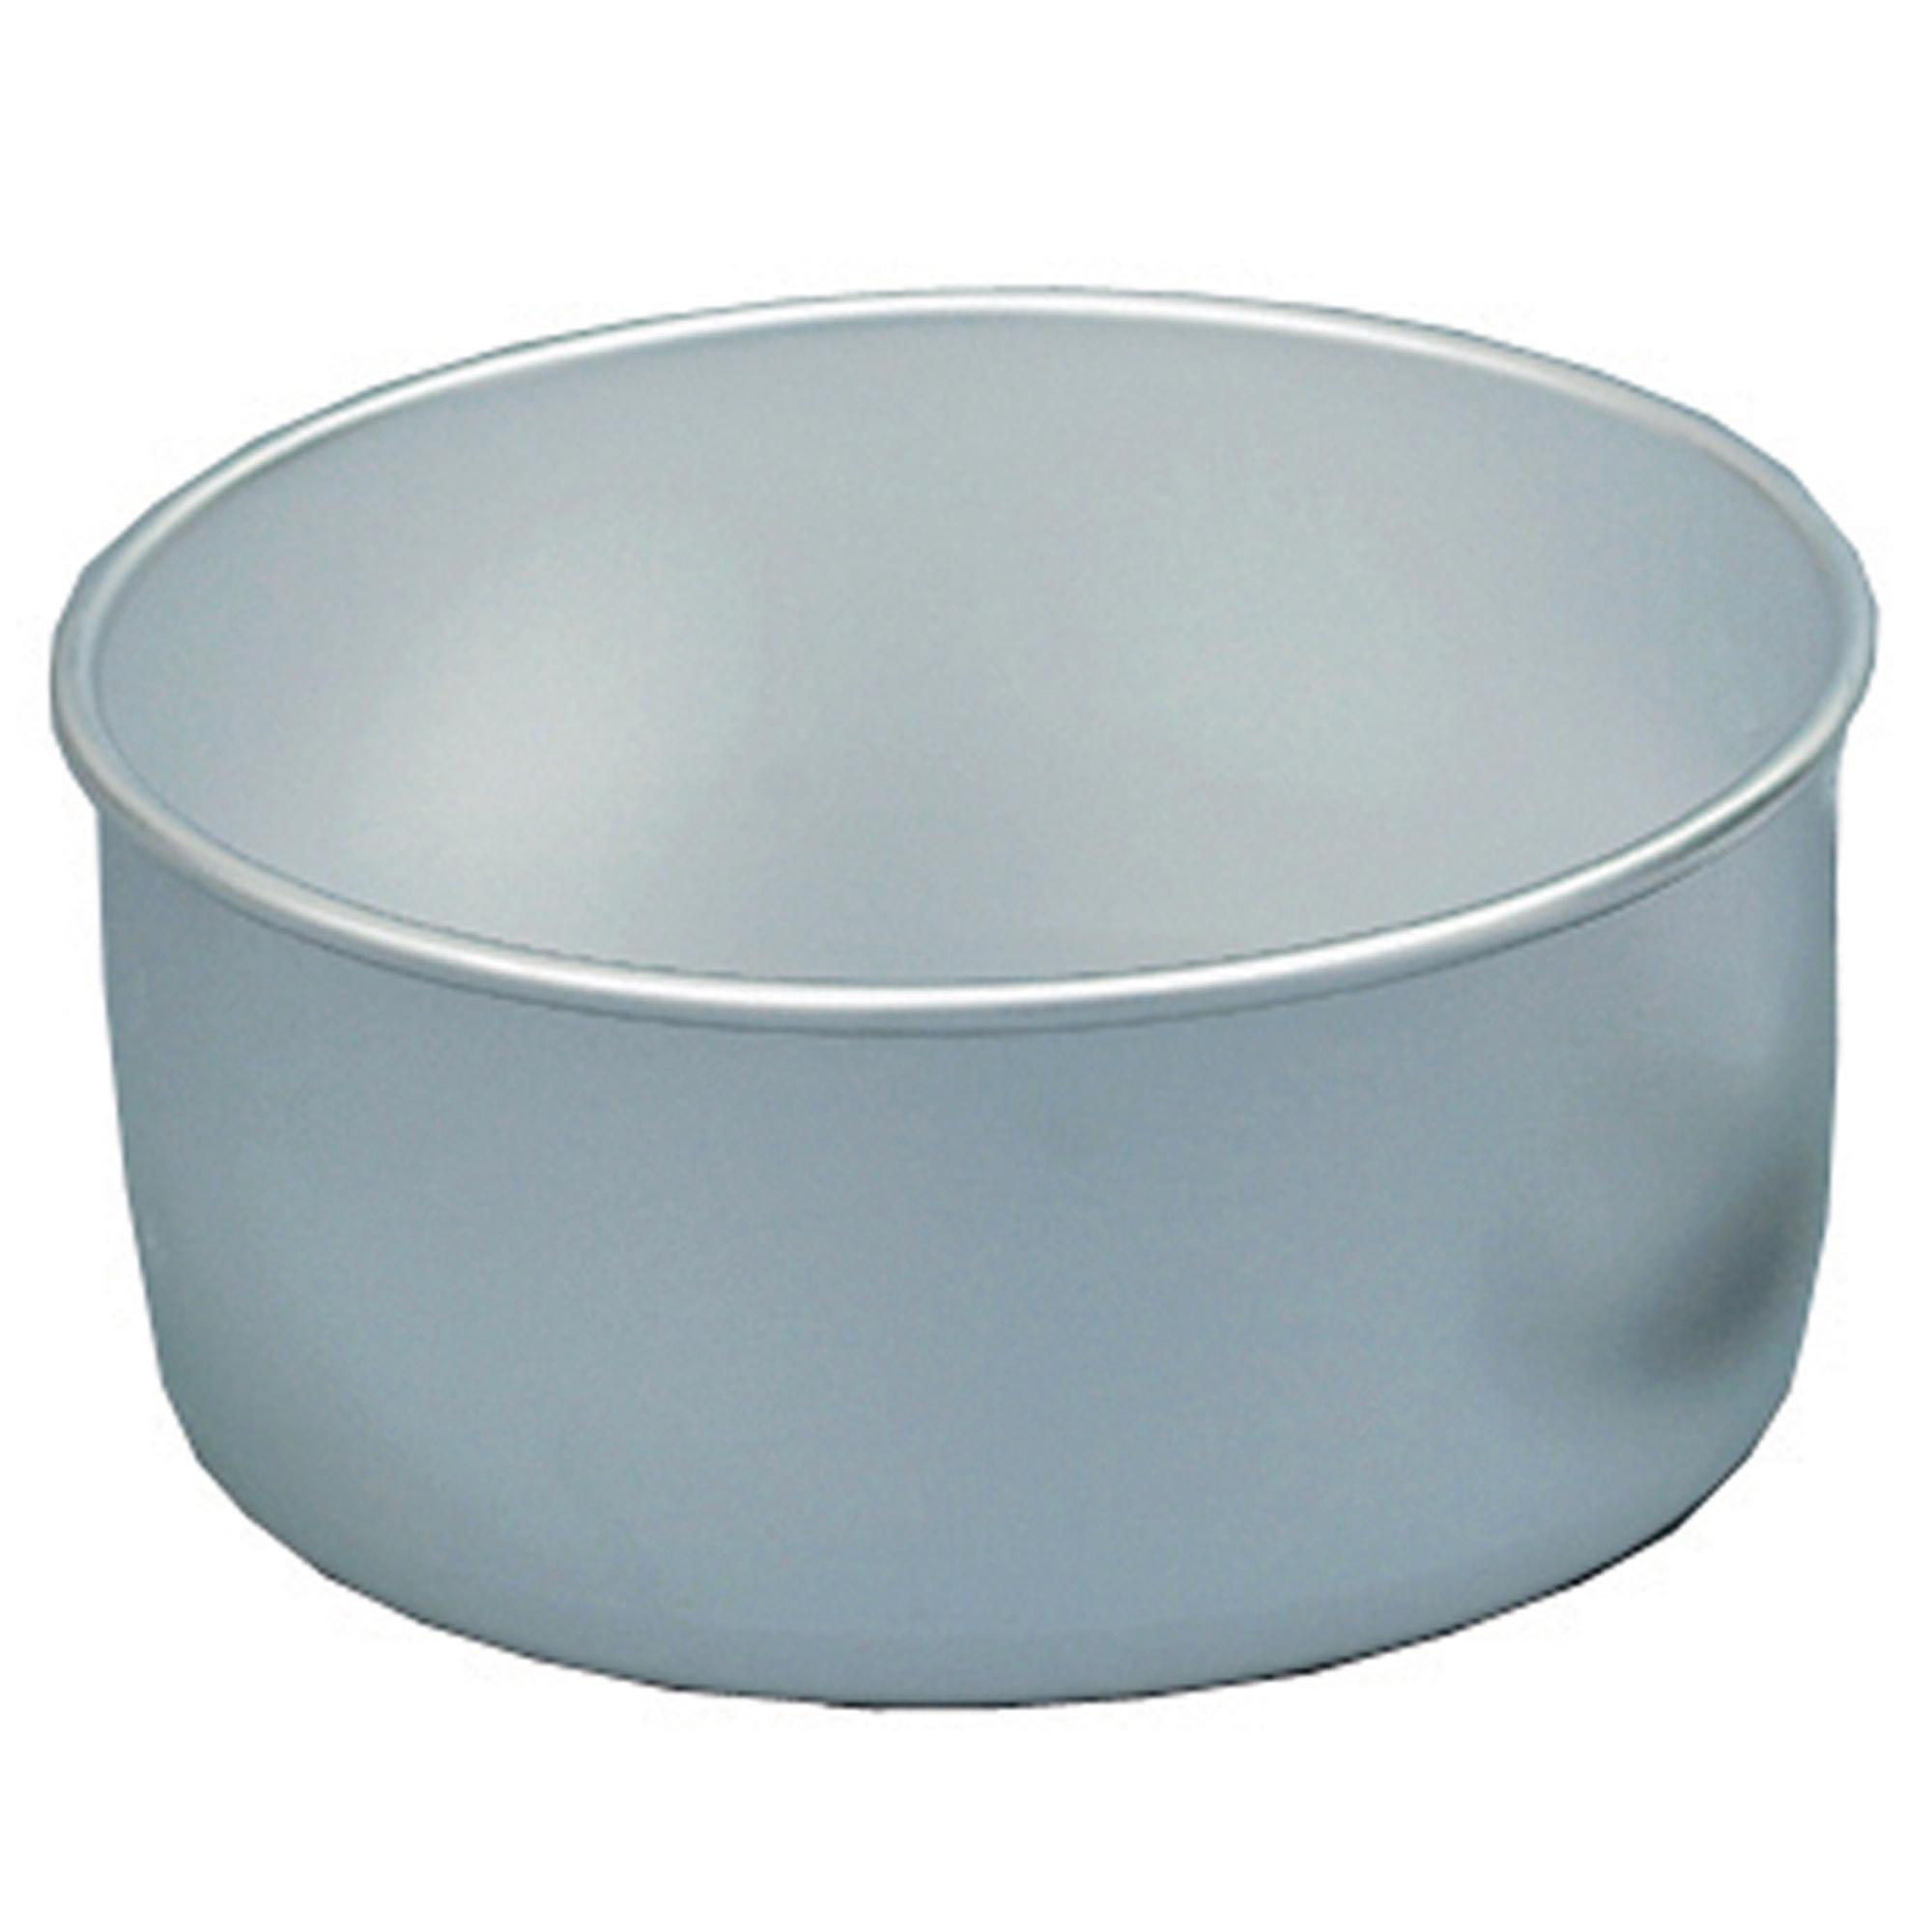 Trangia 1.75L Outer Aluminium Saucepan (Trangia 25 Series) Silver